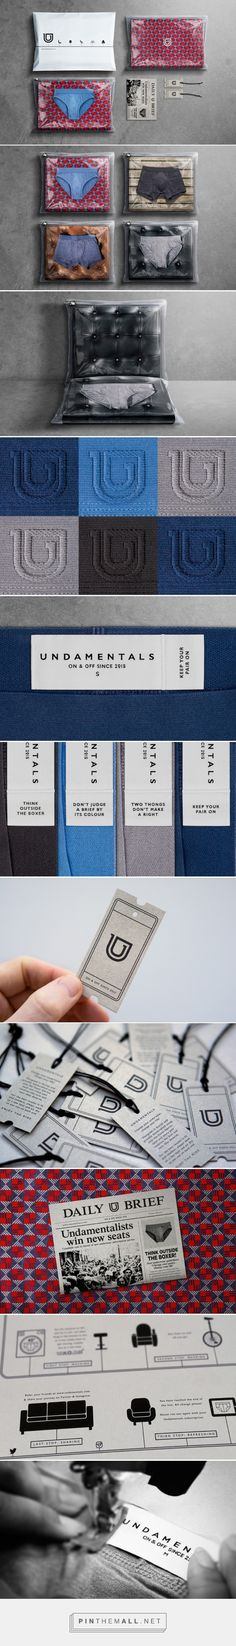 Undamentals underwear packaging designed by Afterhours (Switzerland)… Packaging Design Inspiration, Logo Inspiration, Underwear Packaging, Underwear Brands, Cute Packaging, Textiles, Marketing, My Design, Branding